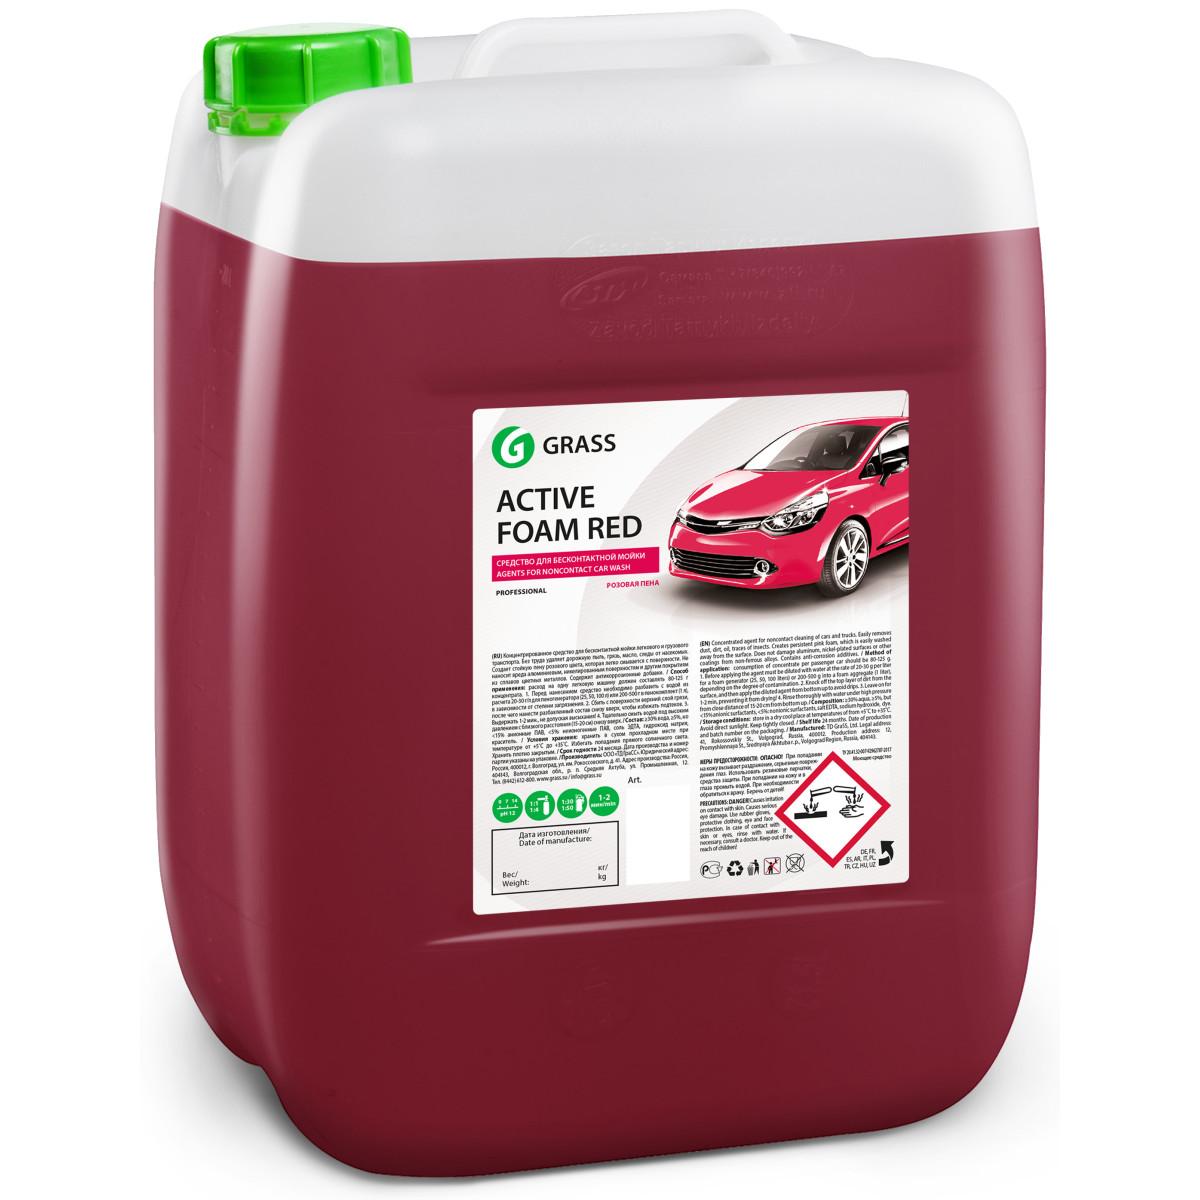 Активная пена Grass Active Foam Red 22 кг